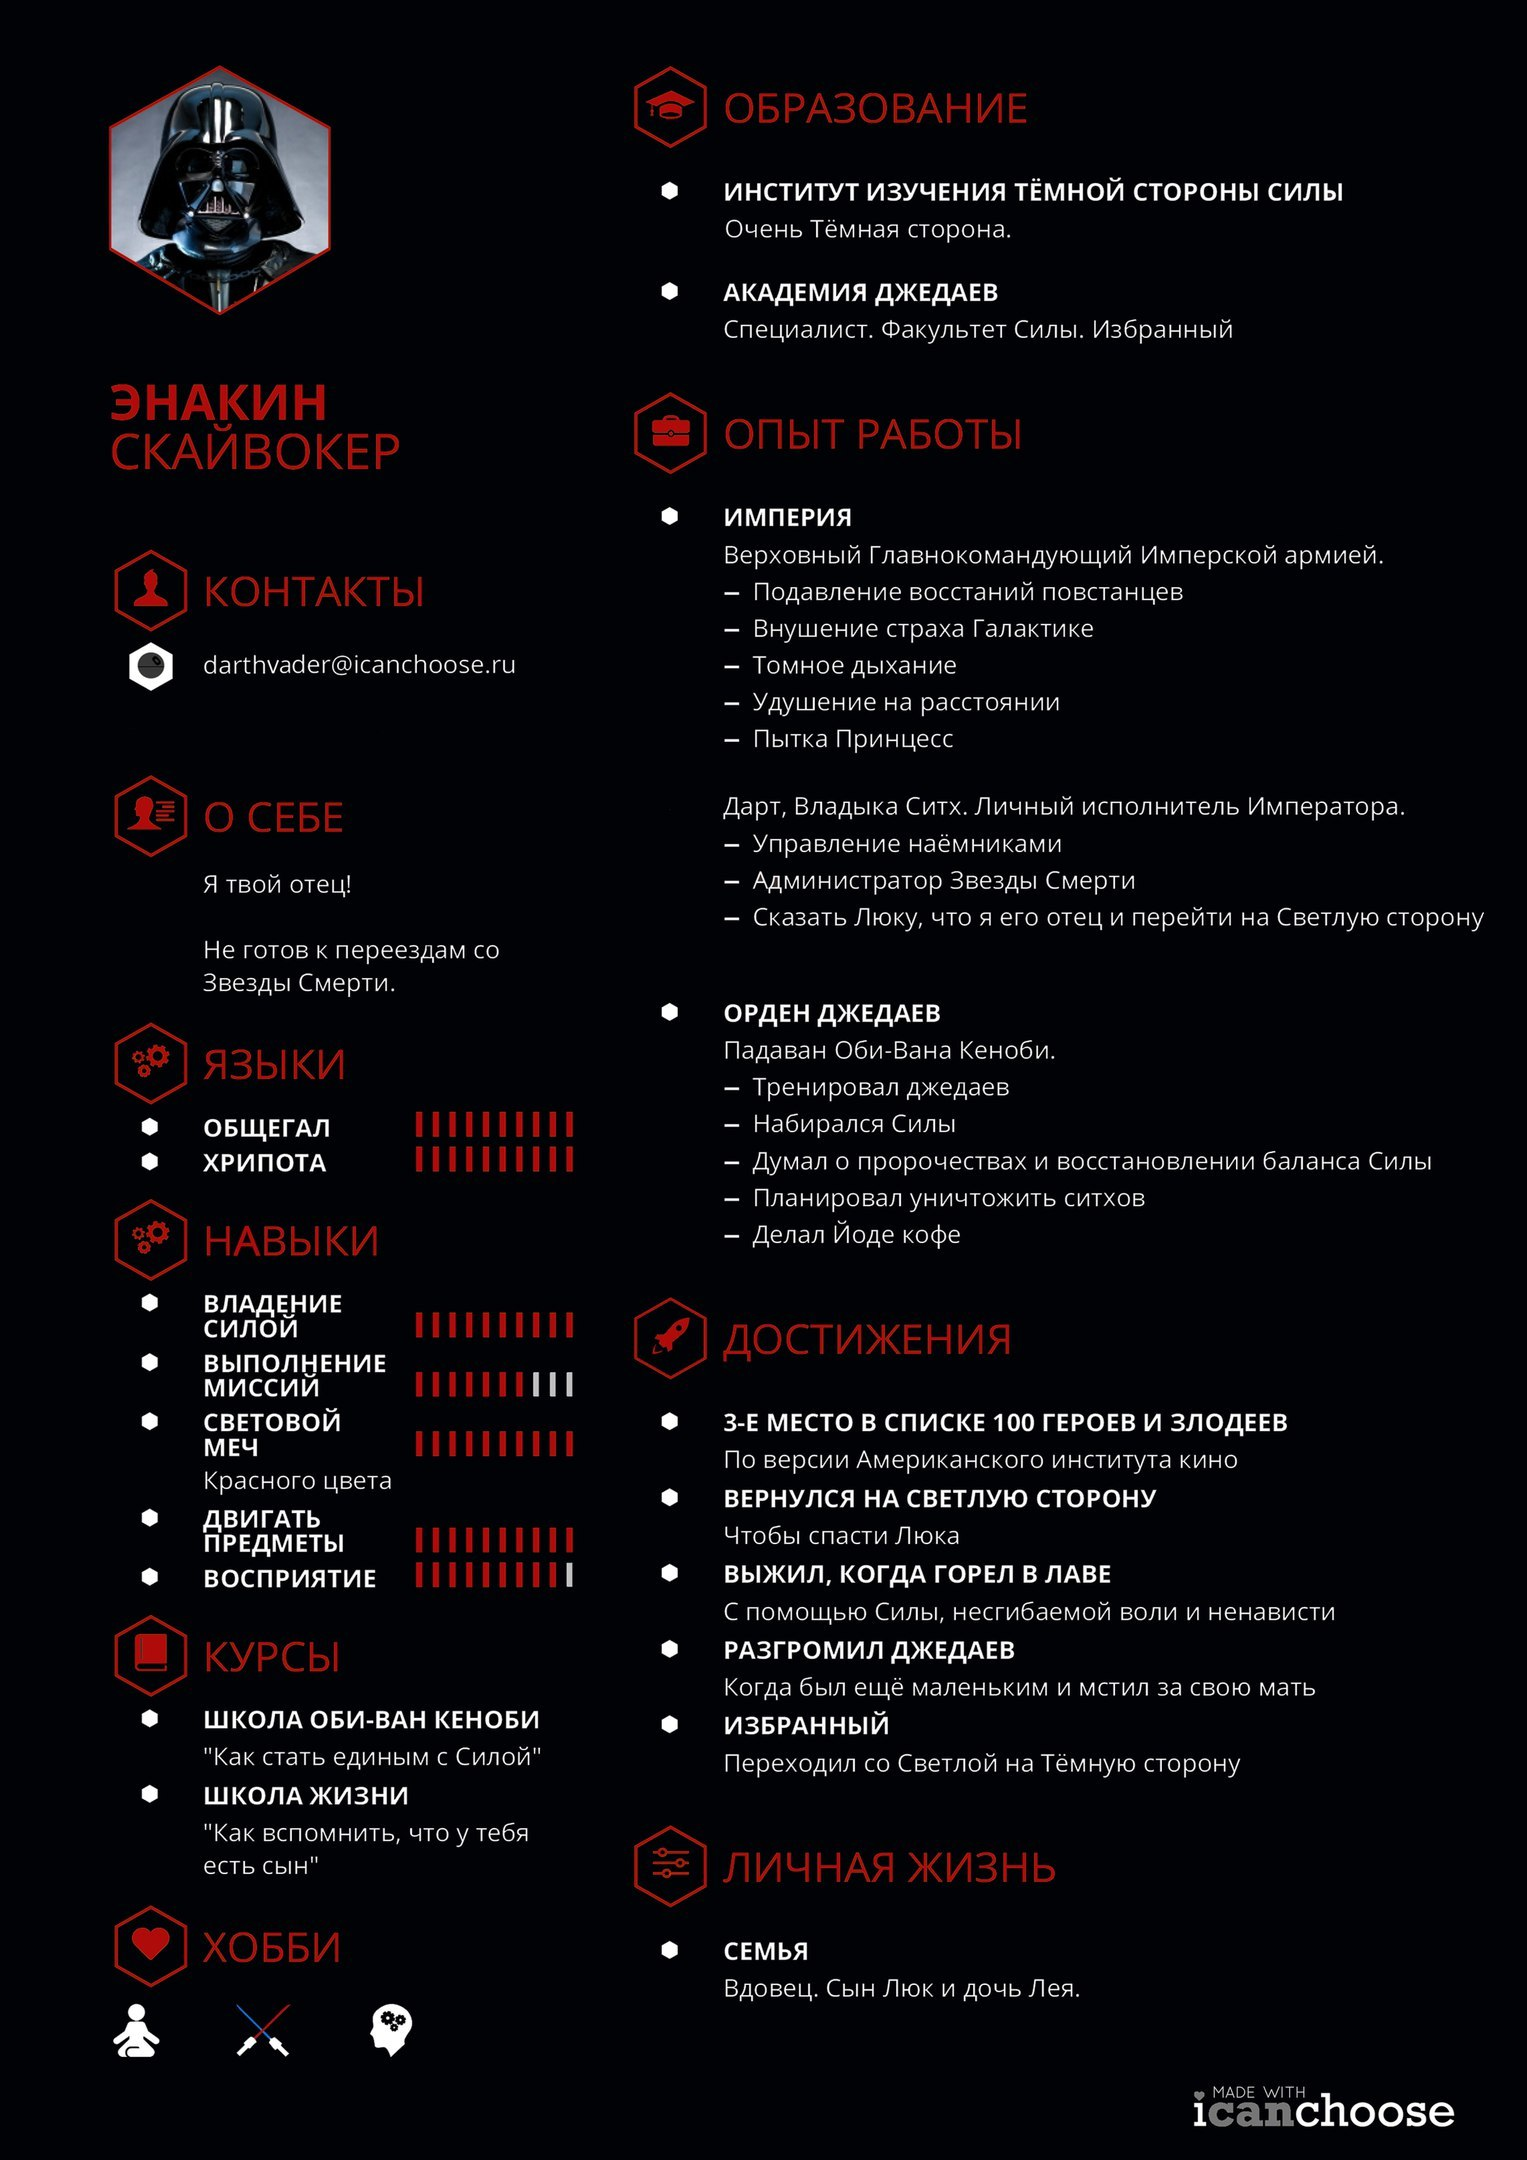 Резюме Дарта Вейдера - 2